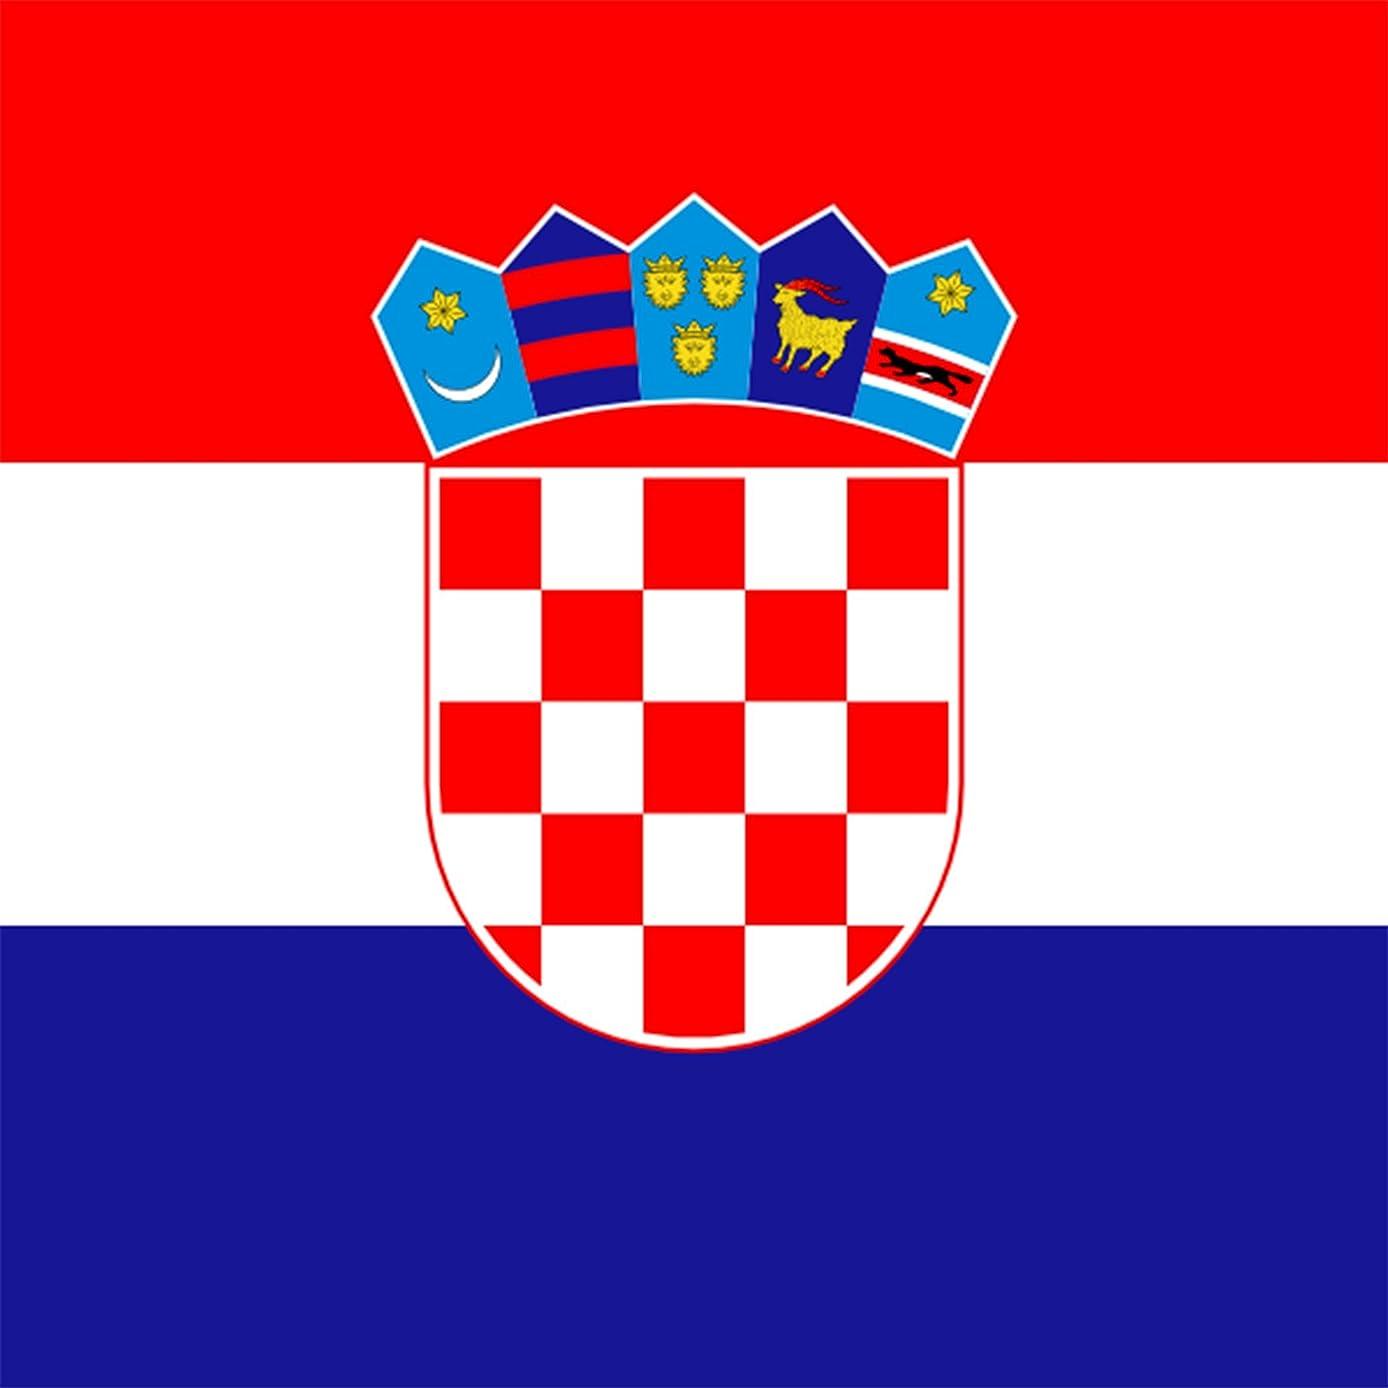 Croatia - World Country National Flags - Vinyl Sticker